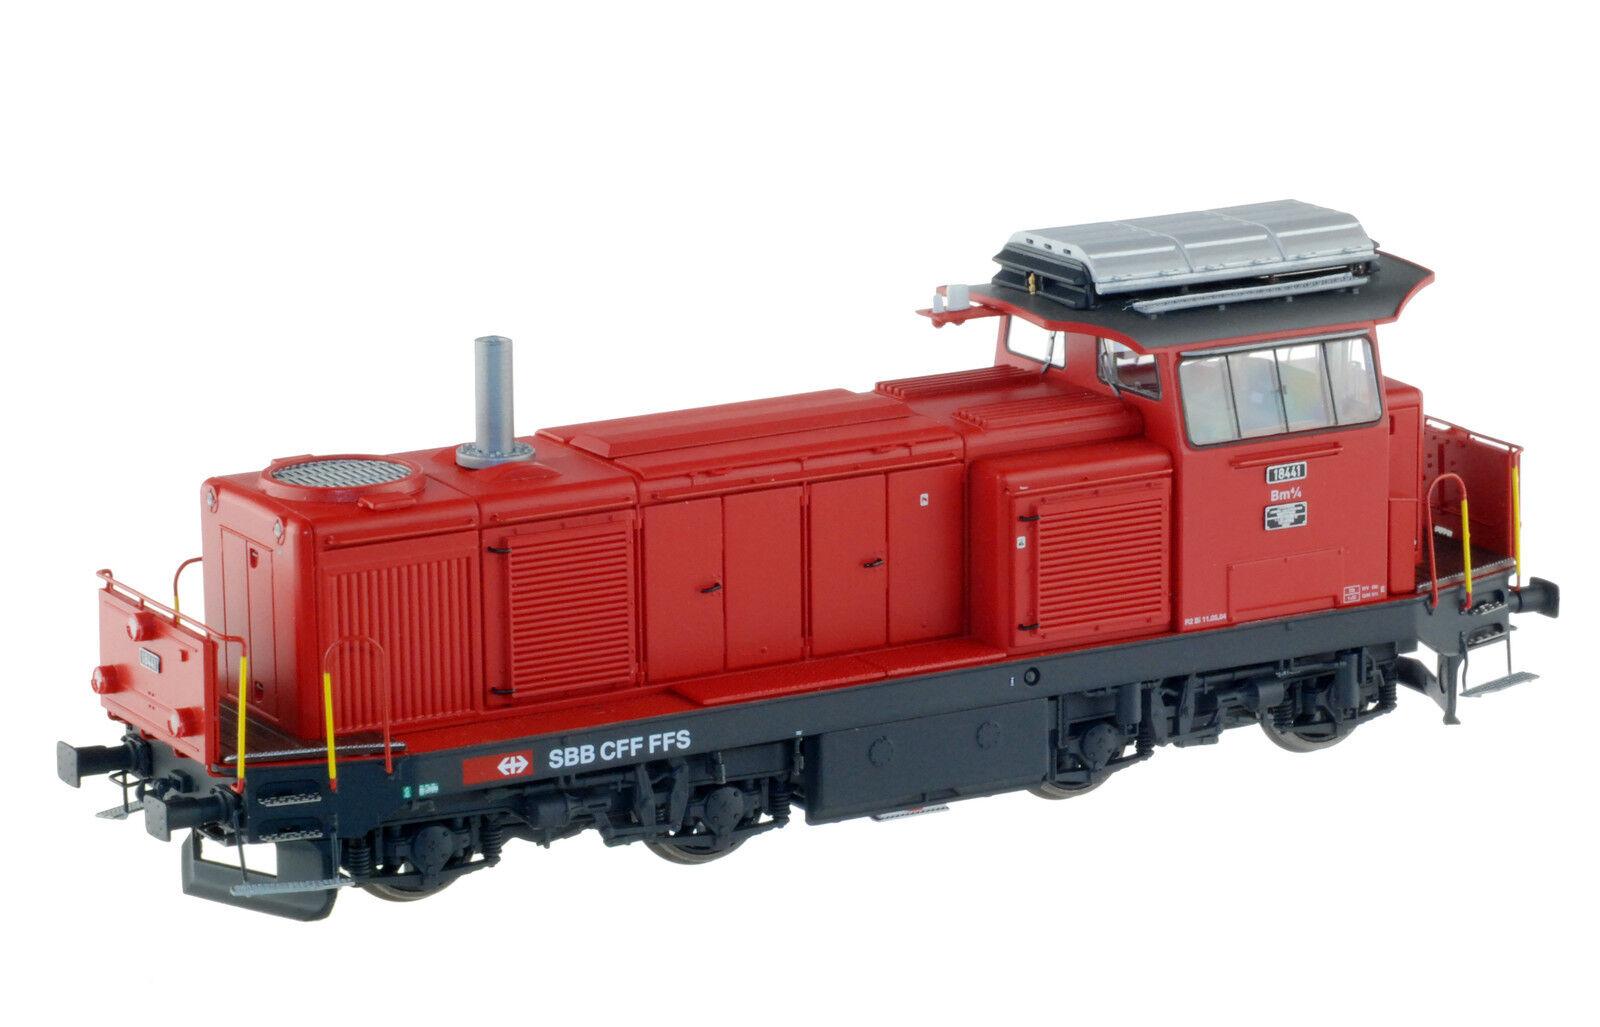 LS Models 17065s SBB CFF FFS bm4/4 Diesel-Lok rosso logo nuovo ep4-5 SOUND NUOVO + OVP